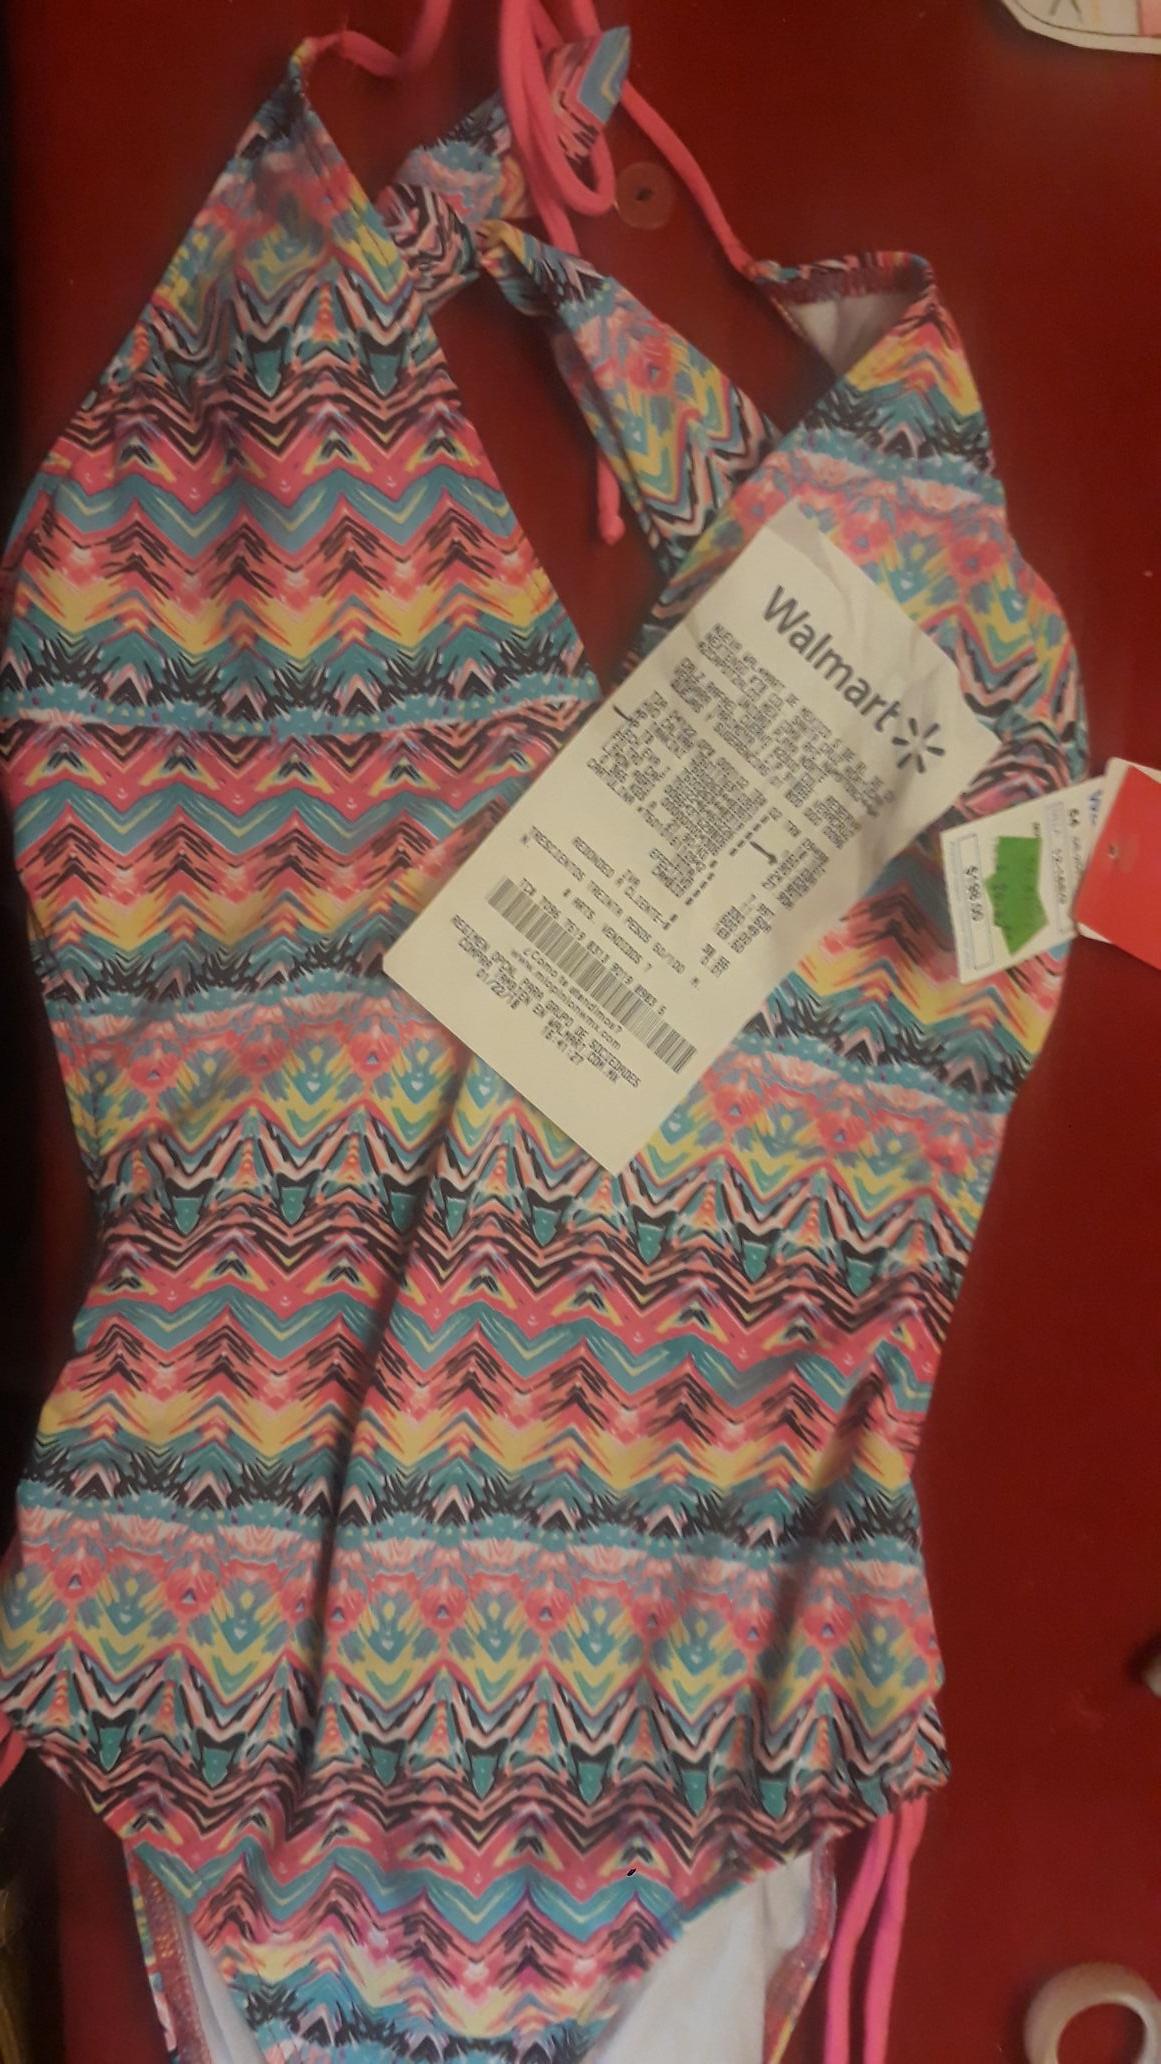 Walmart norte veracruz: Traje de baño para niña talla 14 $90.02